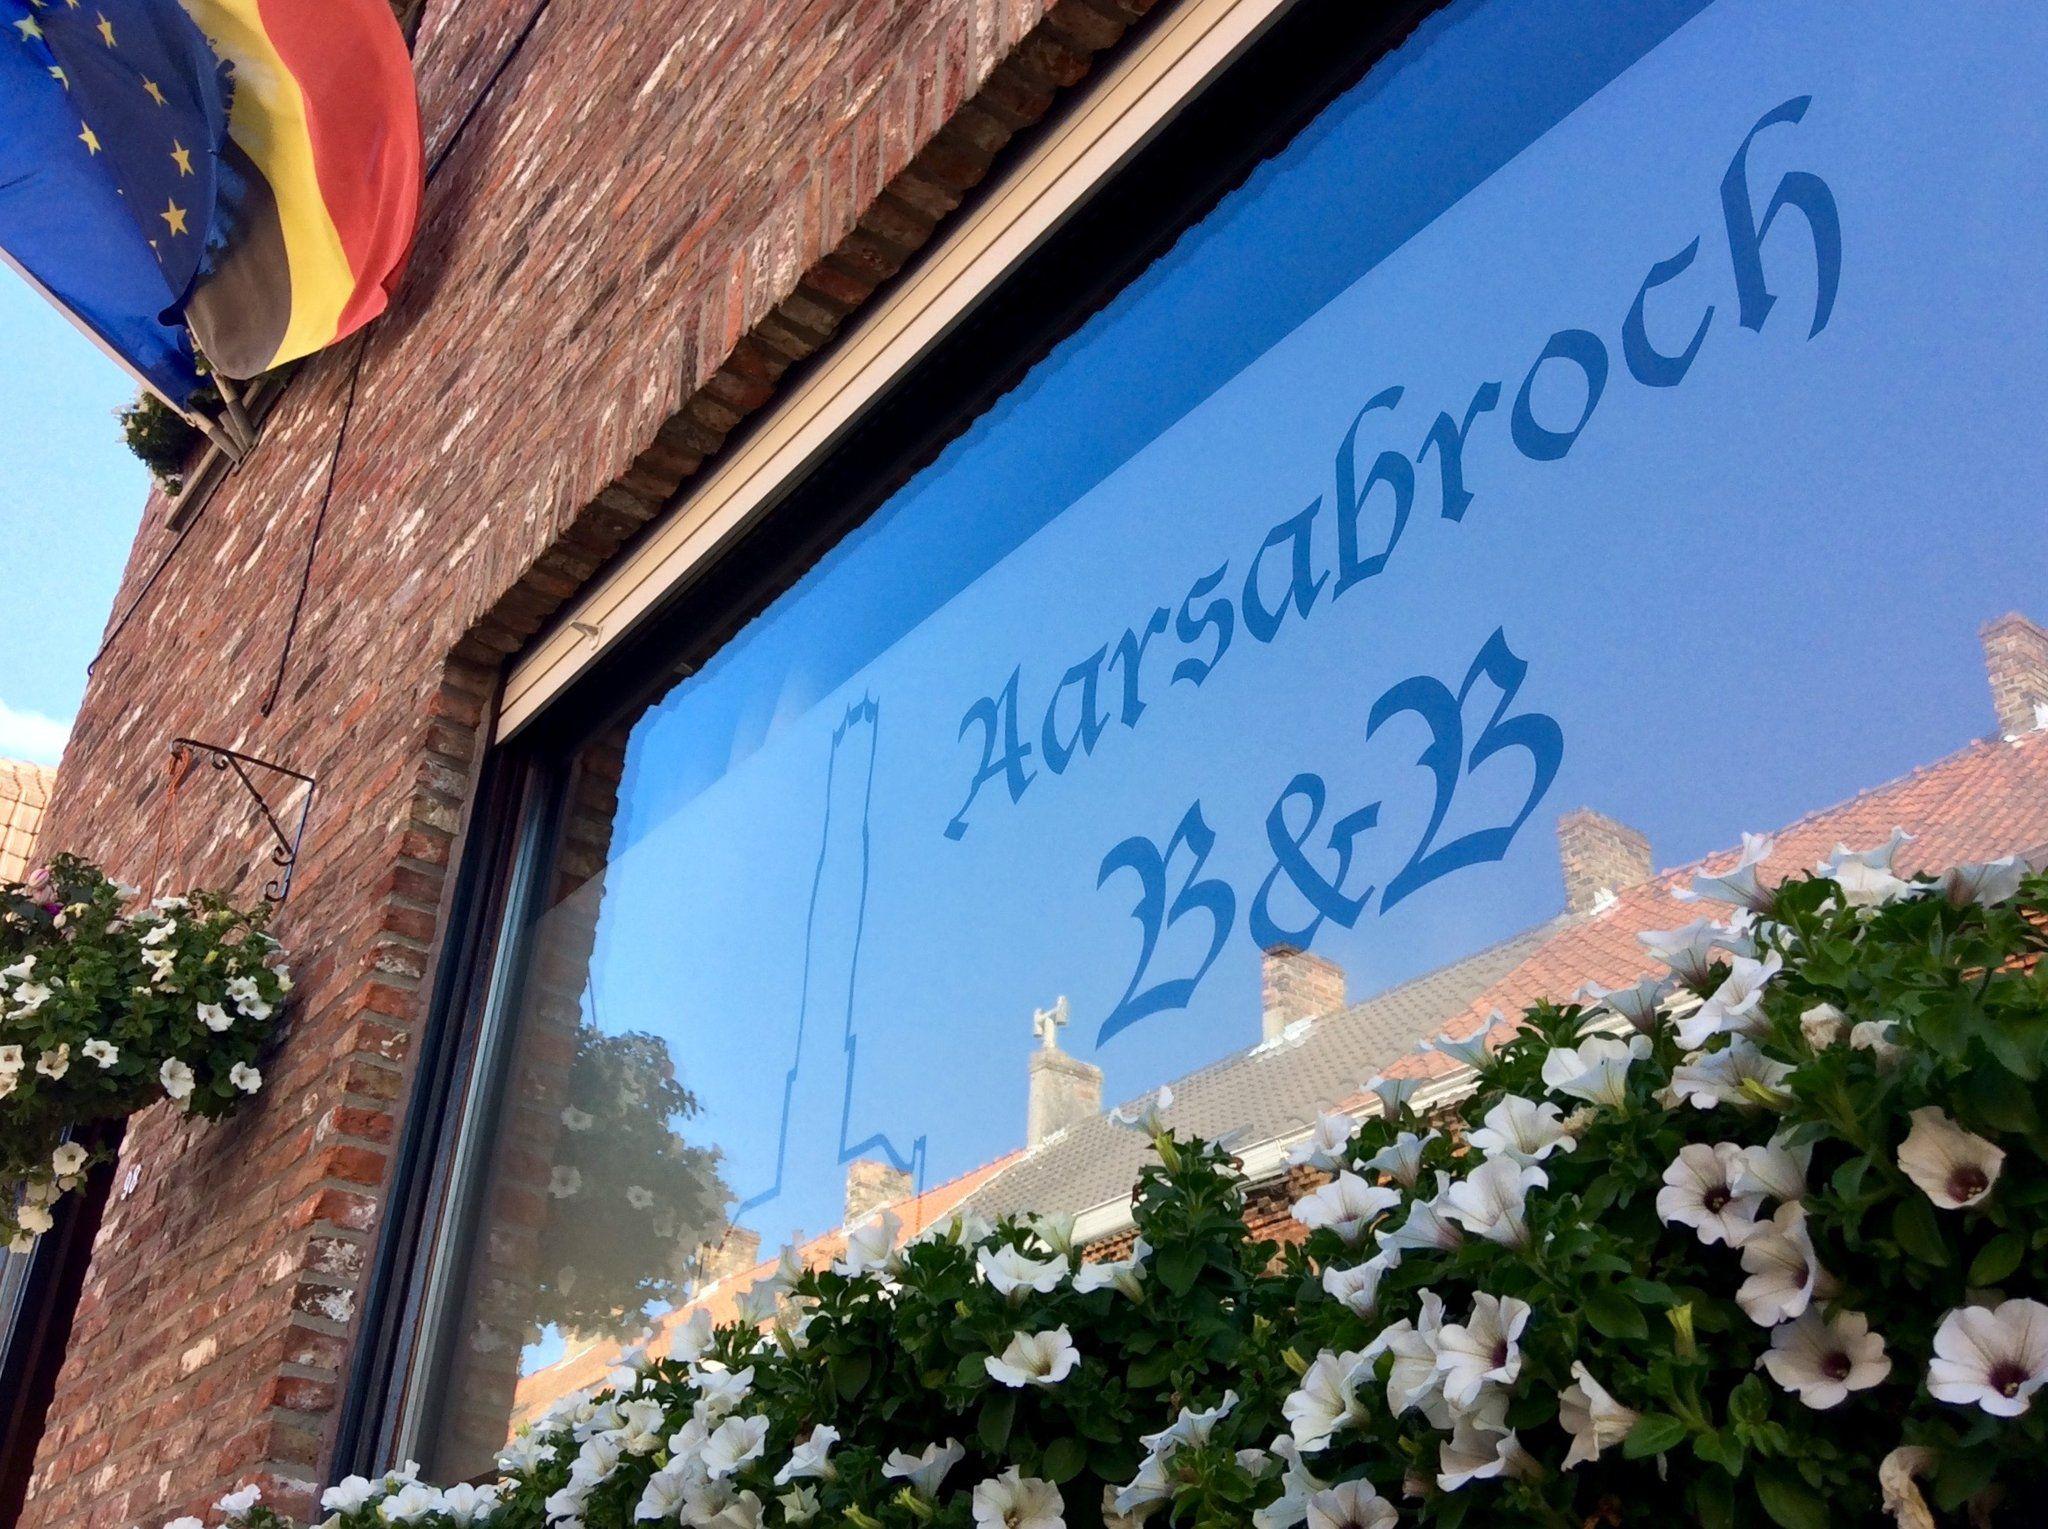 B&B Aarsabroch